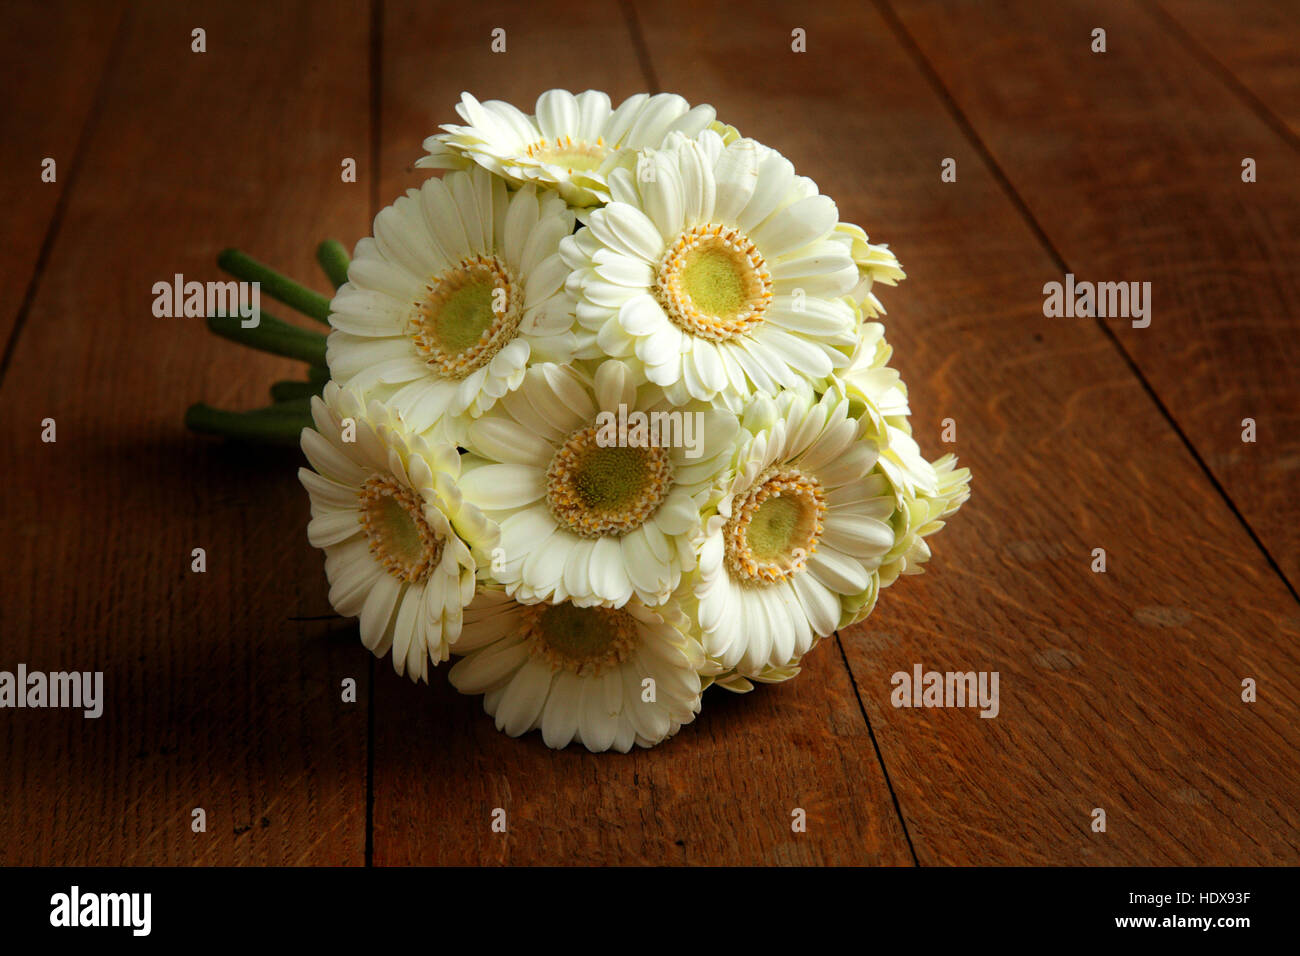 Cream gerbera wedding bouquet on an oak wooden floor. - Stock Image